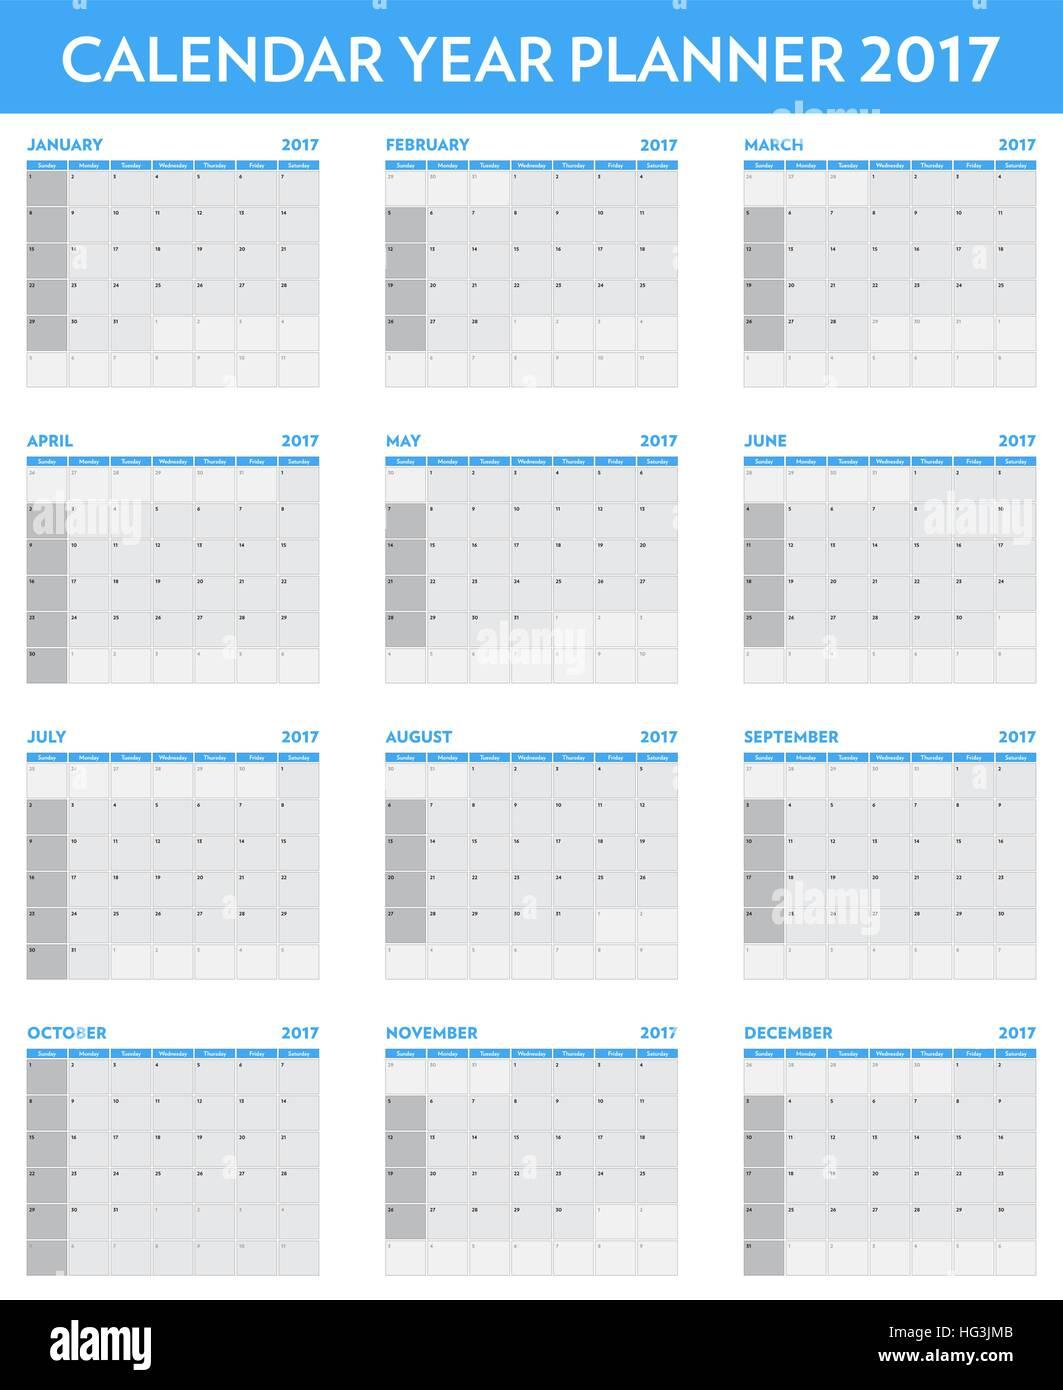 Planner Template Stockfotos & Planner Template Bilder - Alamy